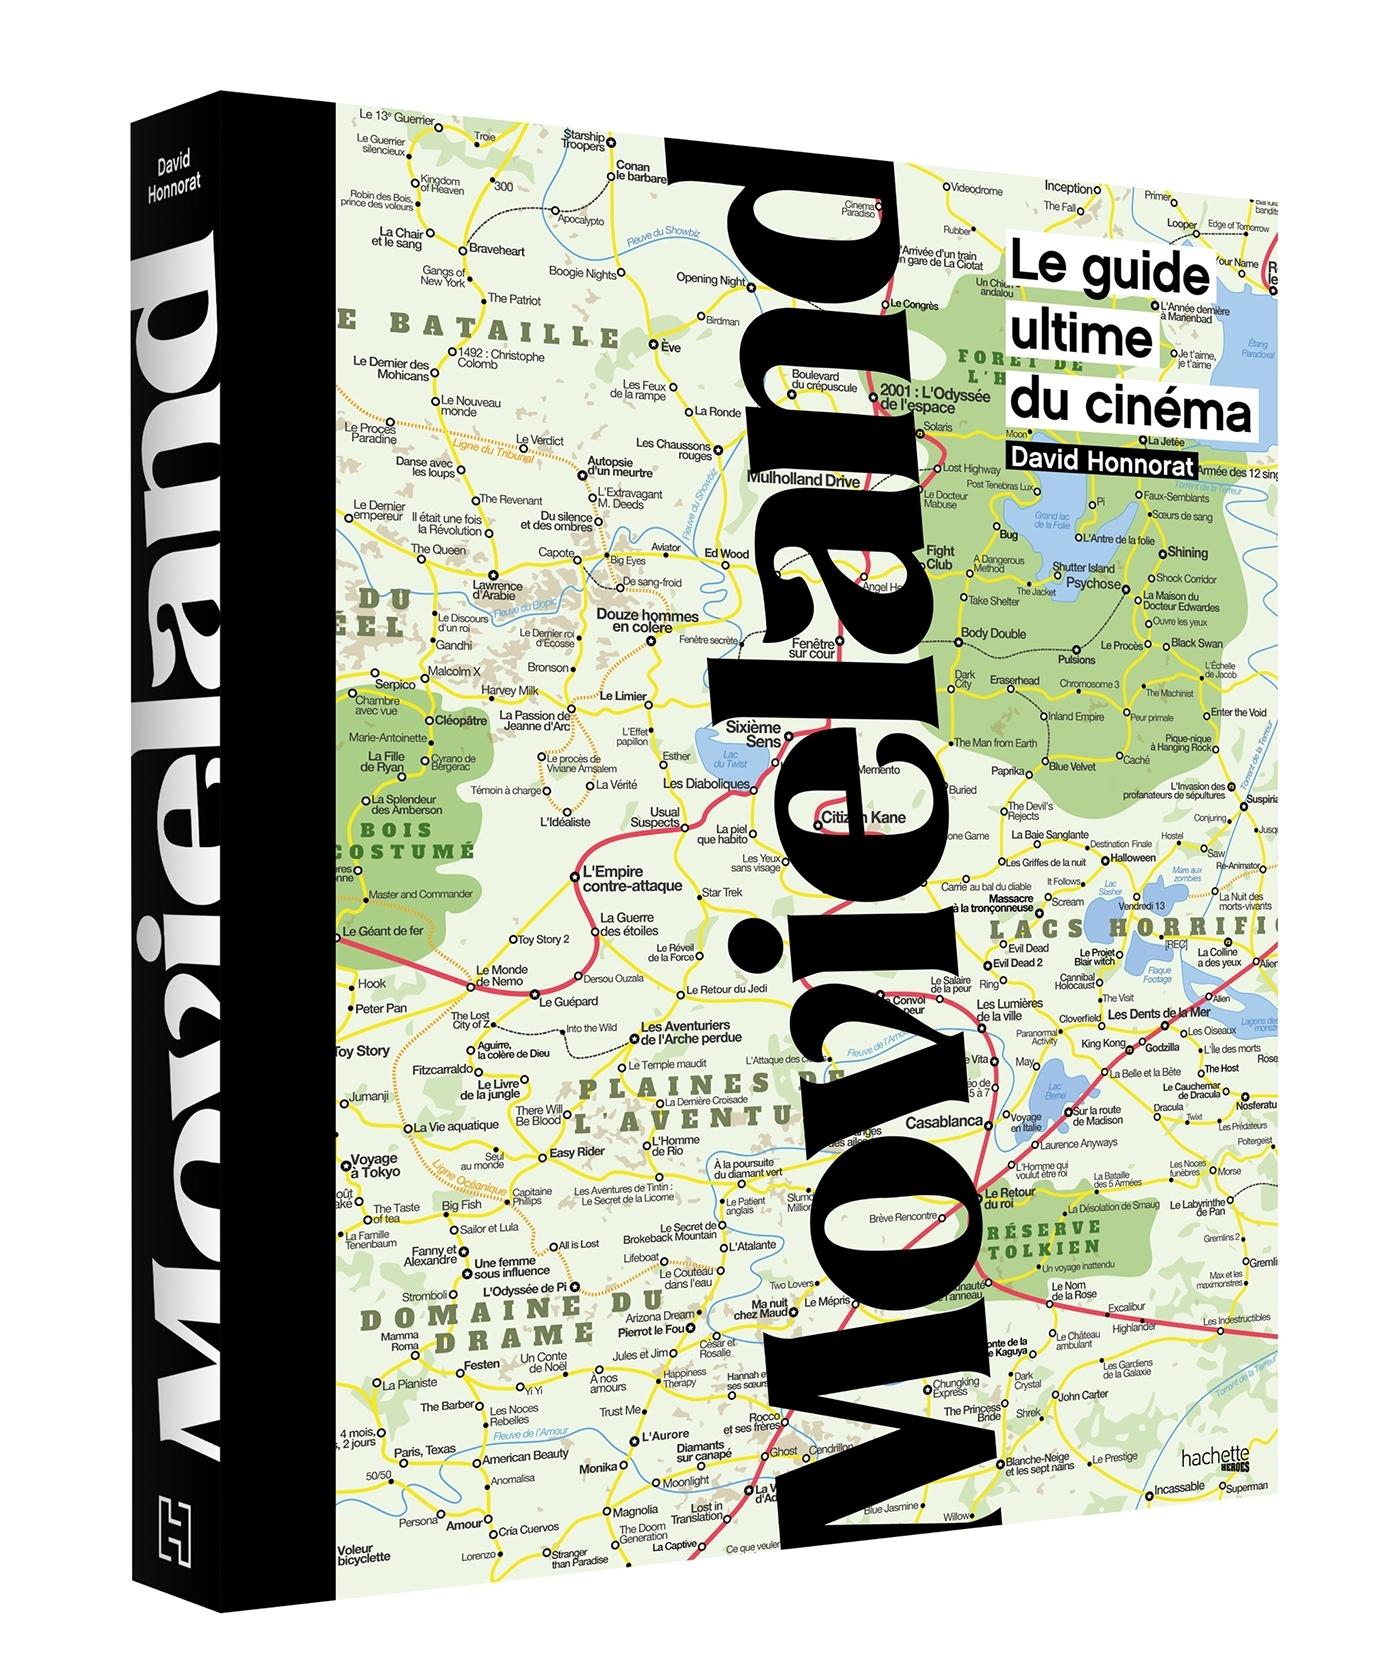 MOVIELAND - LE GUIDE ULTIME DU CINEMA